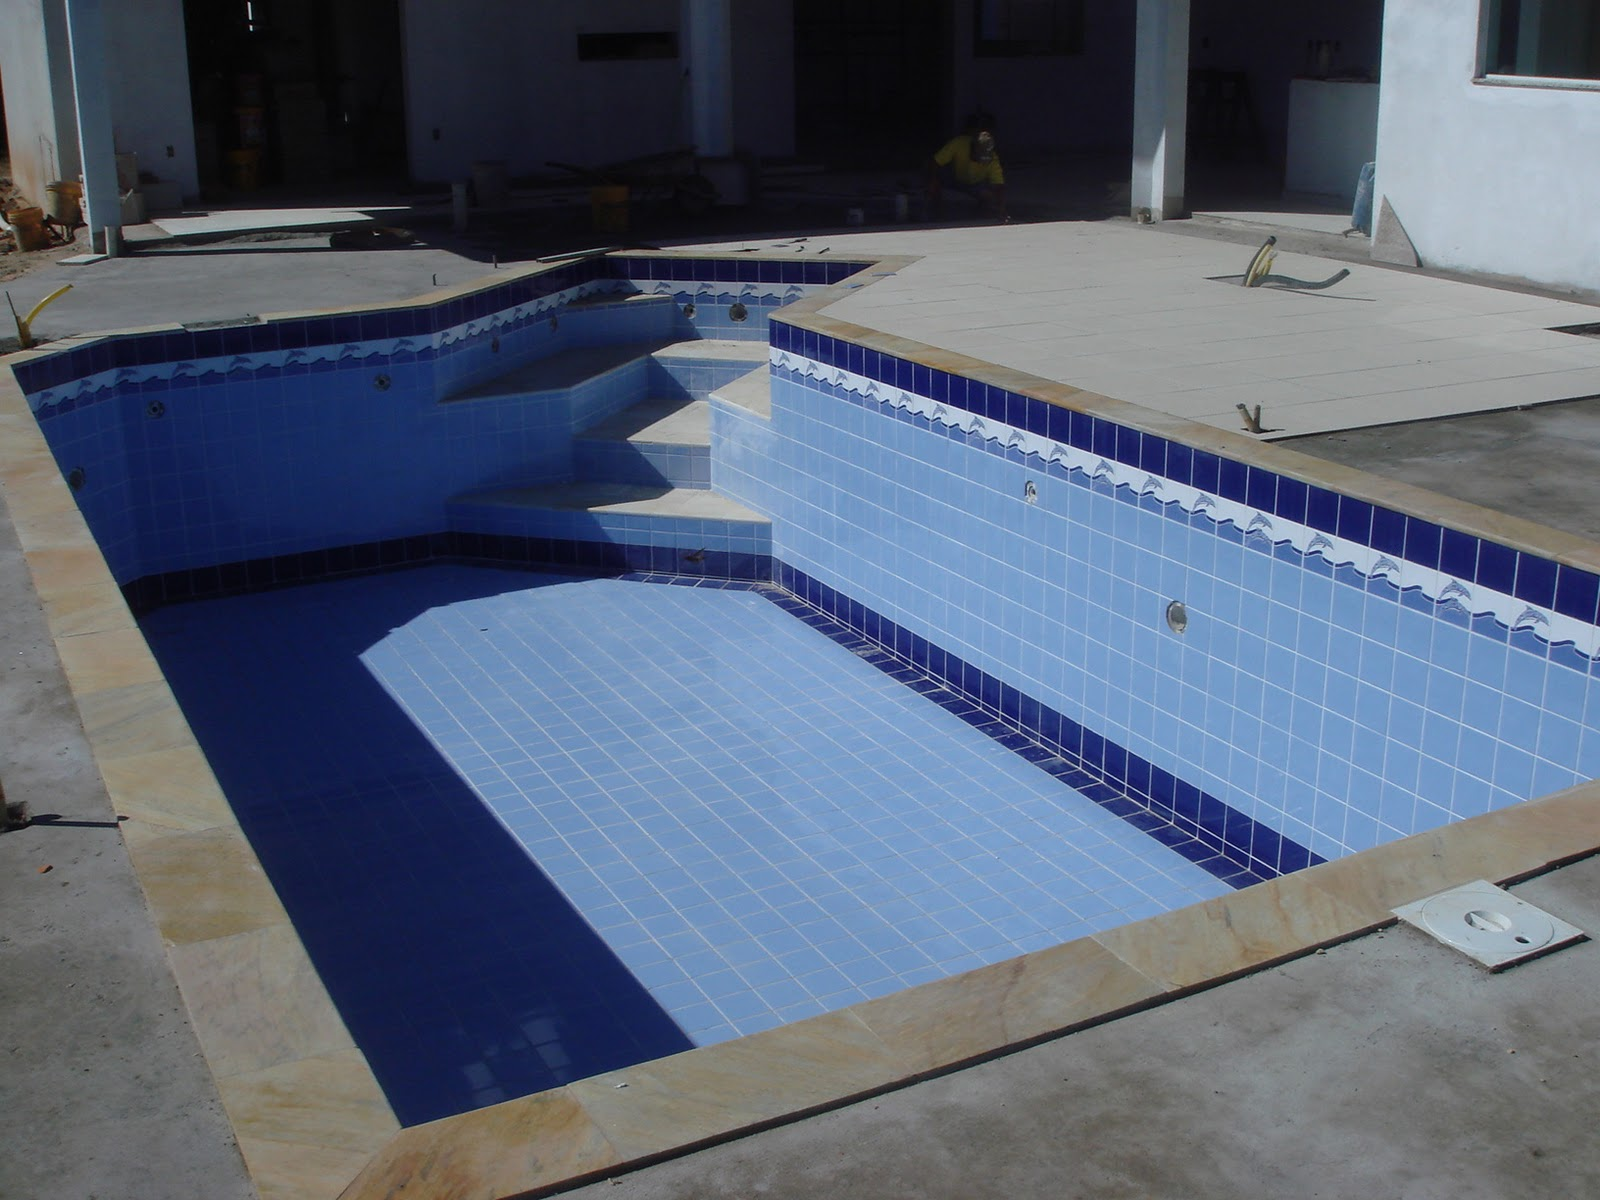 Fa o piscinas 19 9621 8011 19 9240 3570 for Azulejo para piscina